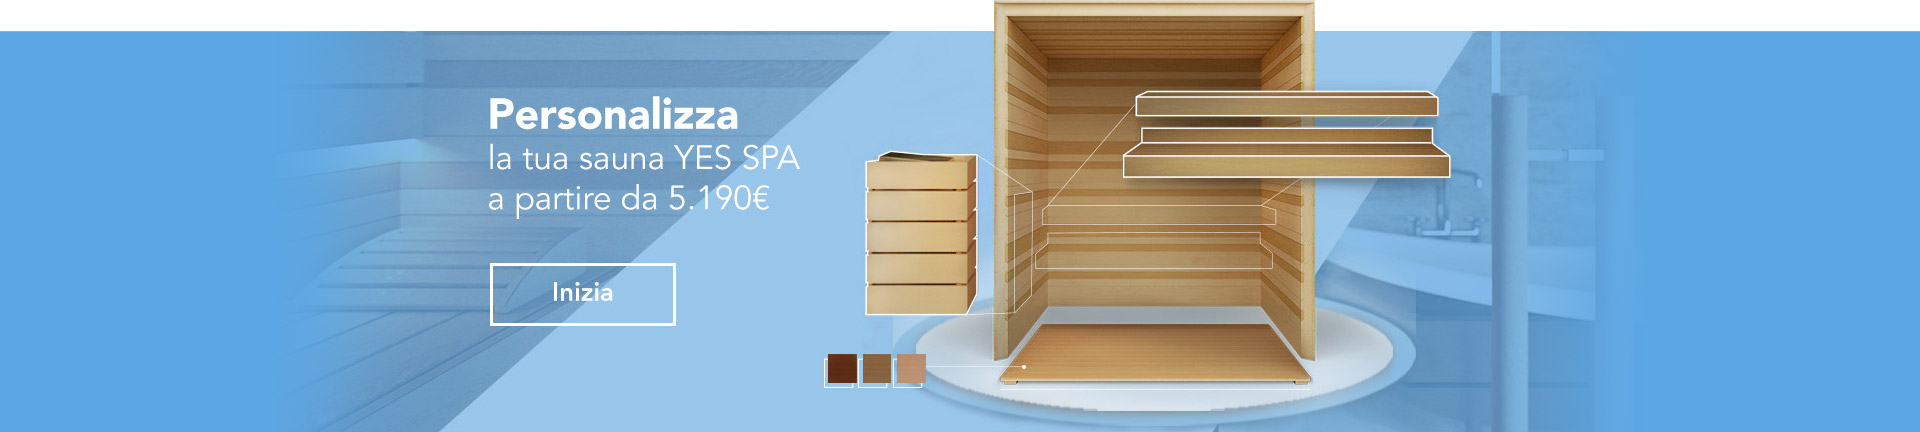 Configura la tua sauna